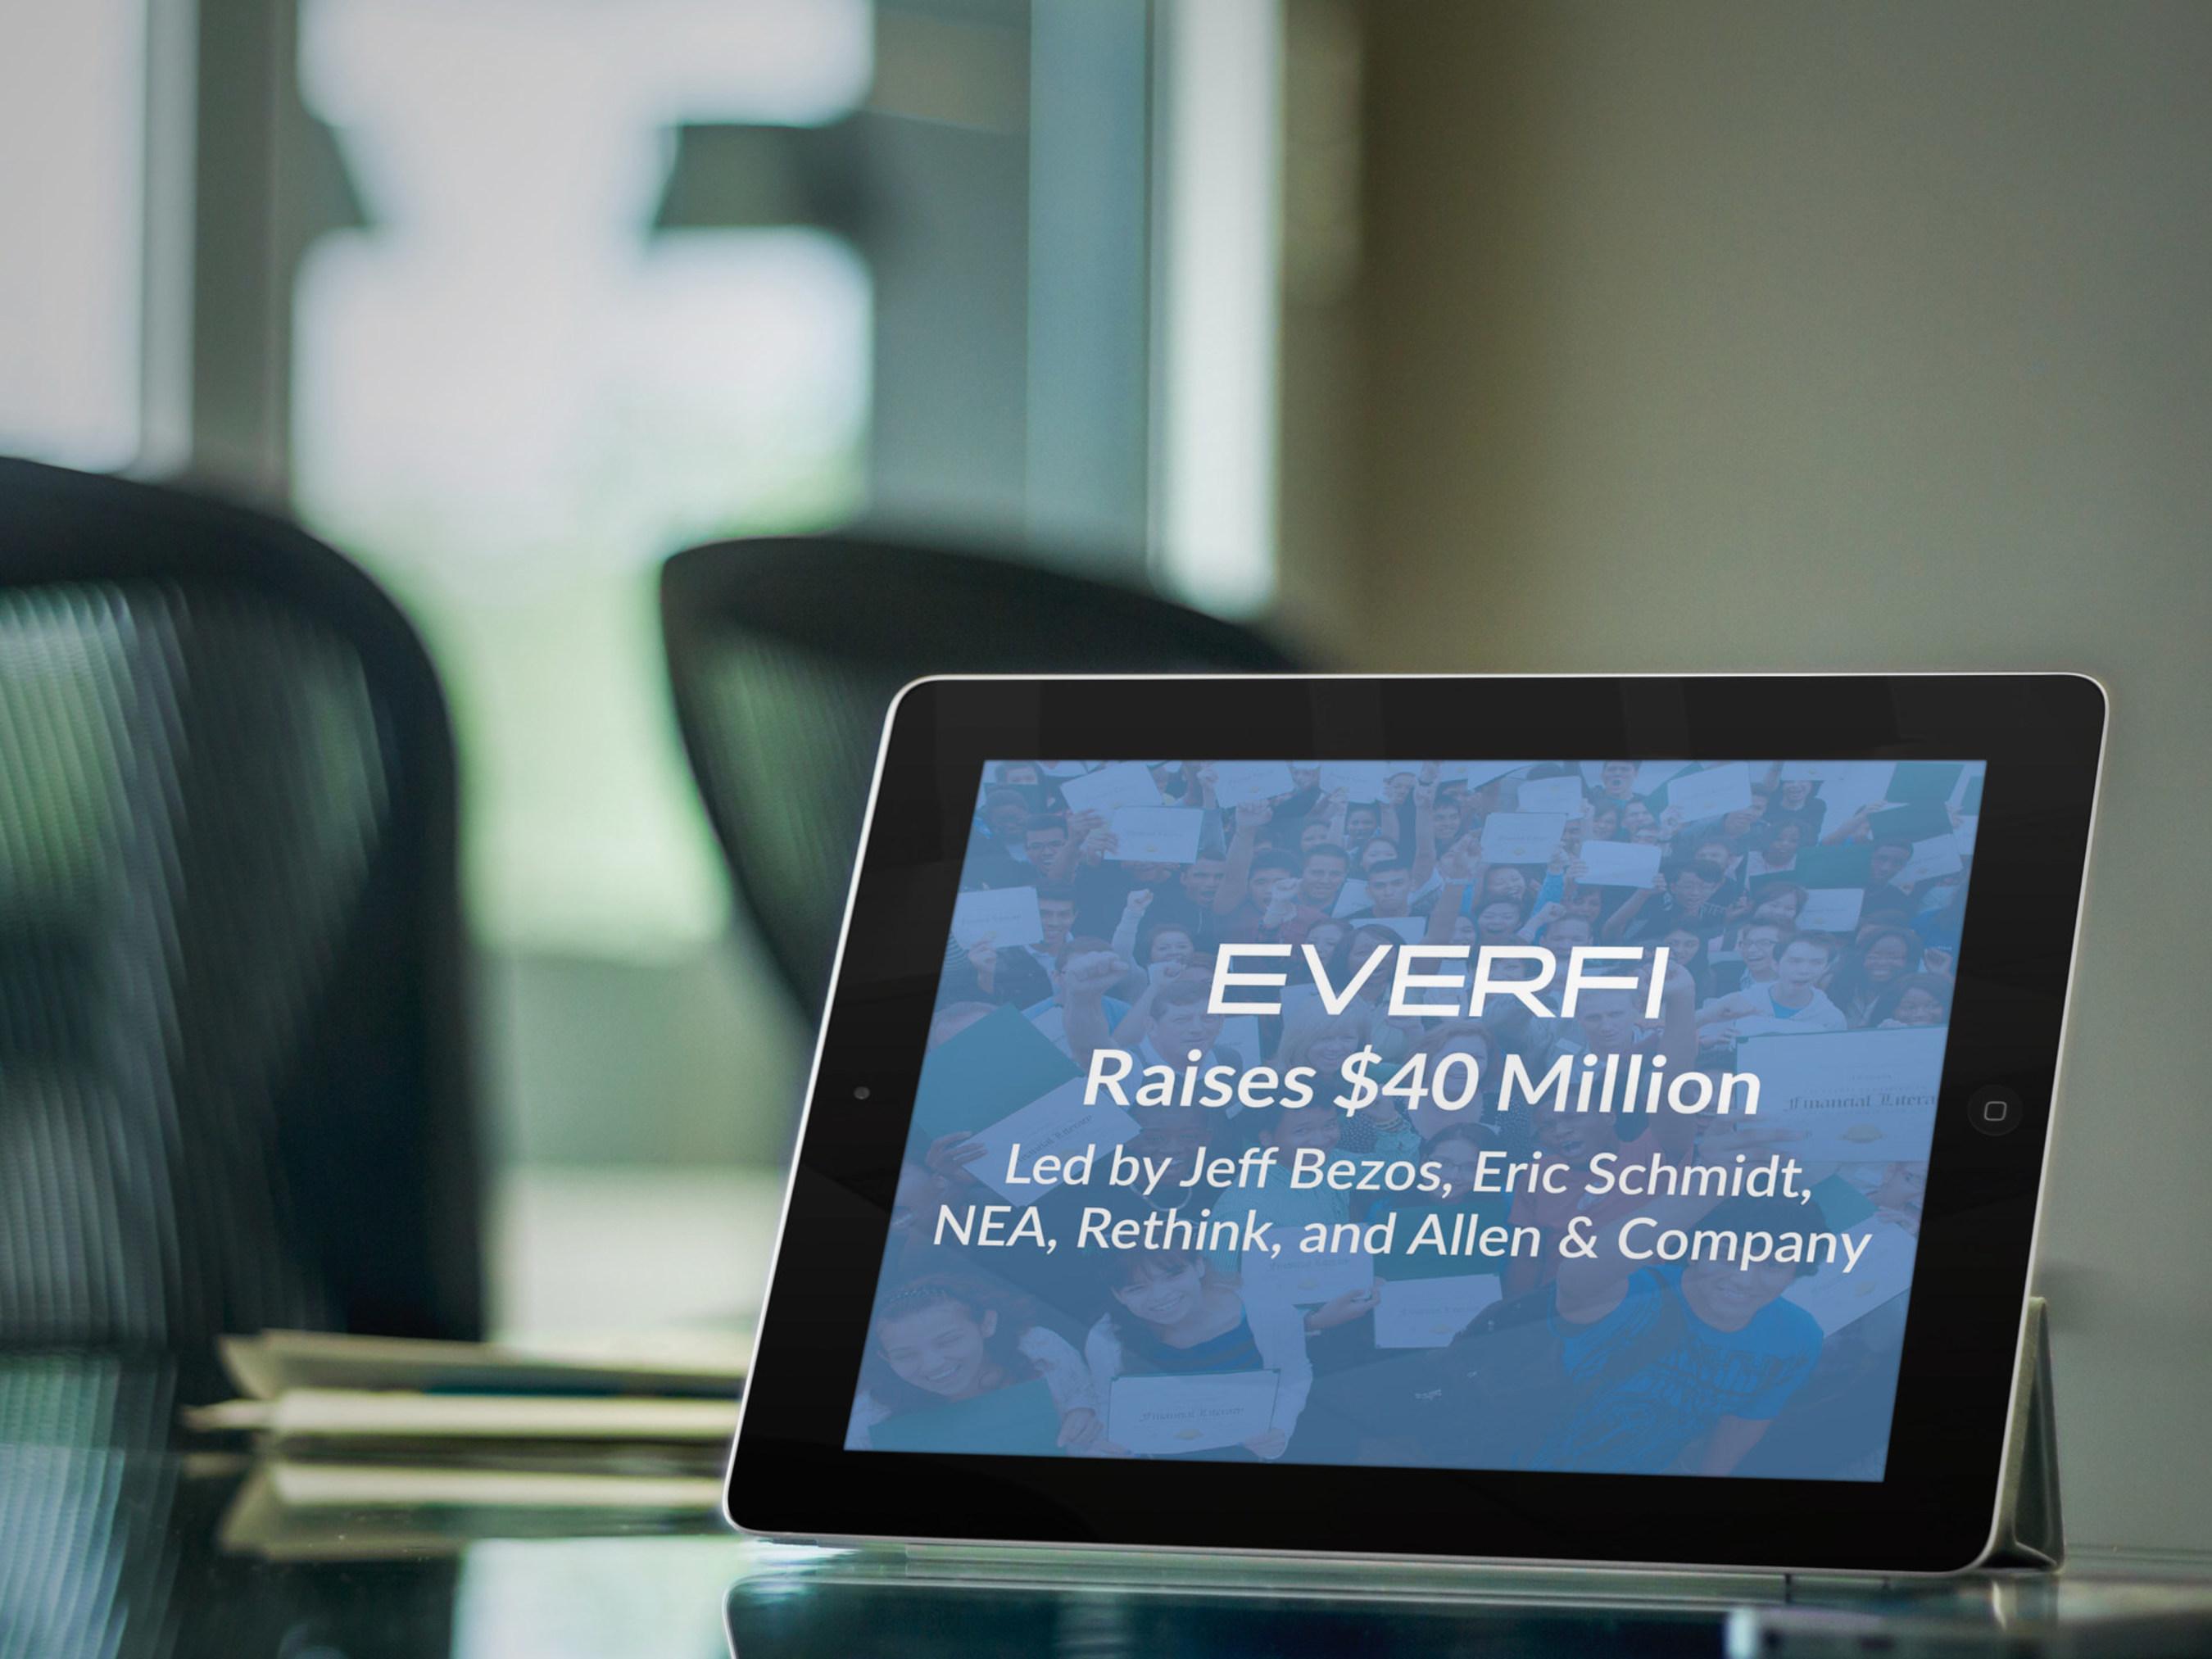 EverFi Raises $40 Million in Funding from Major Technology Leaders